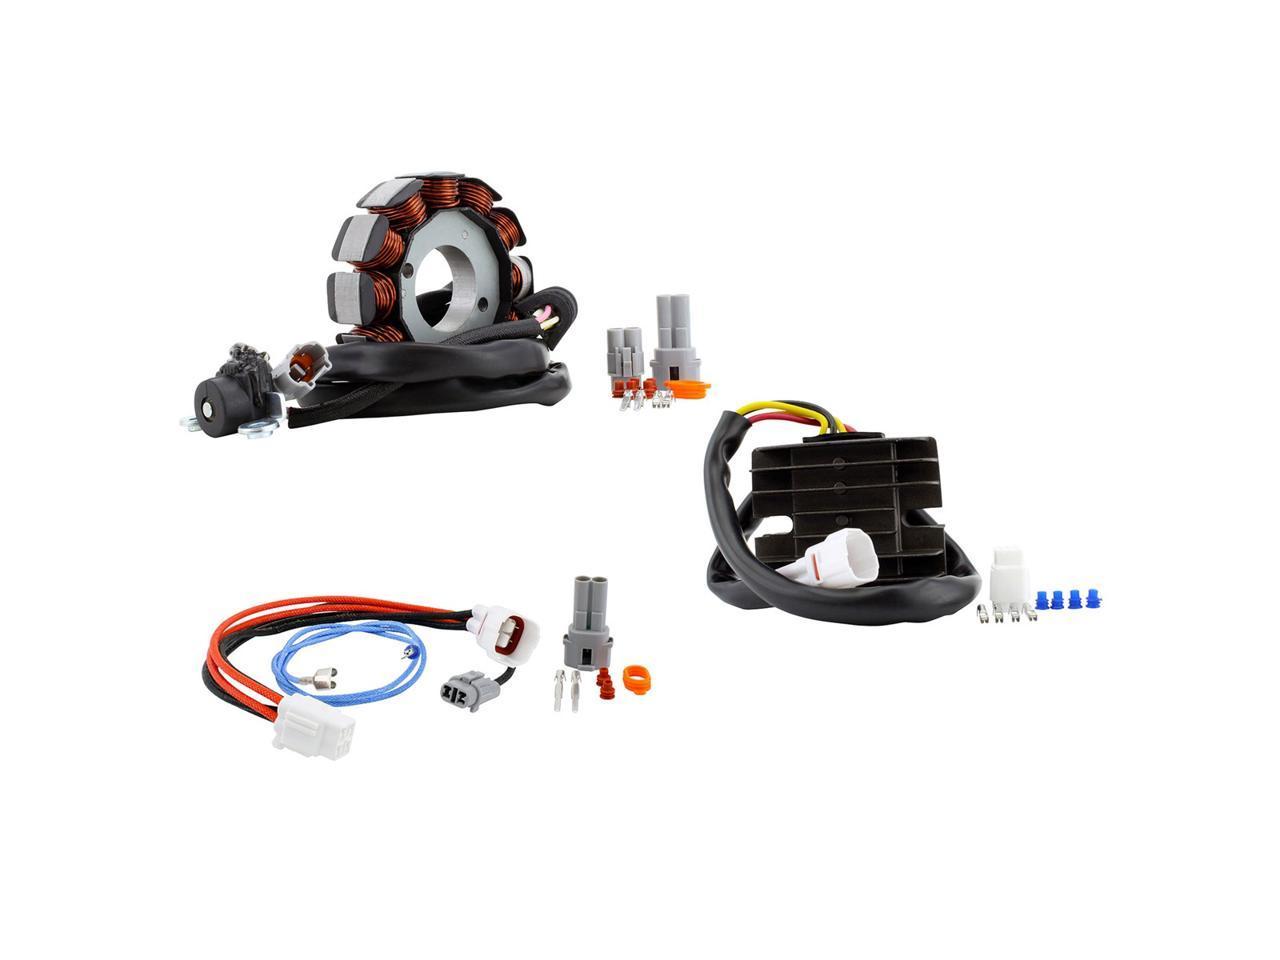 AC to DC Lighting & 140W High Power Stator & Voltage